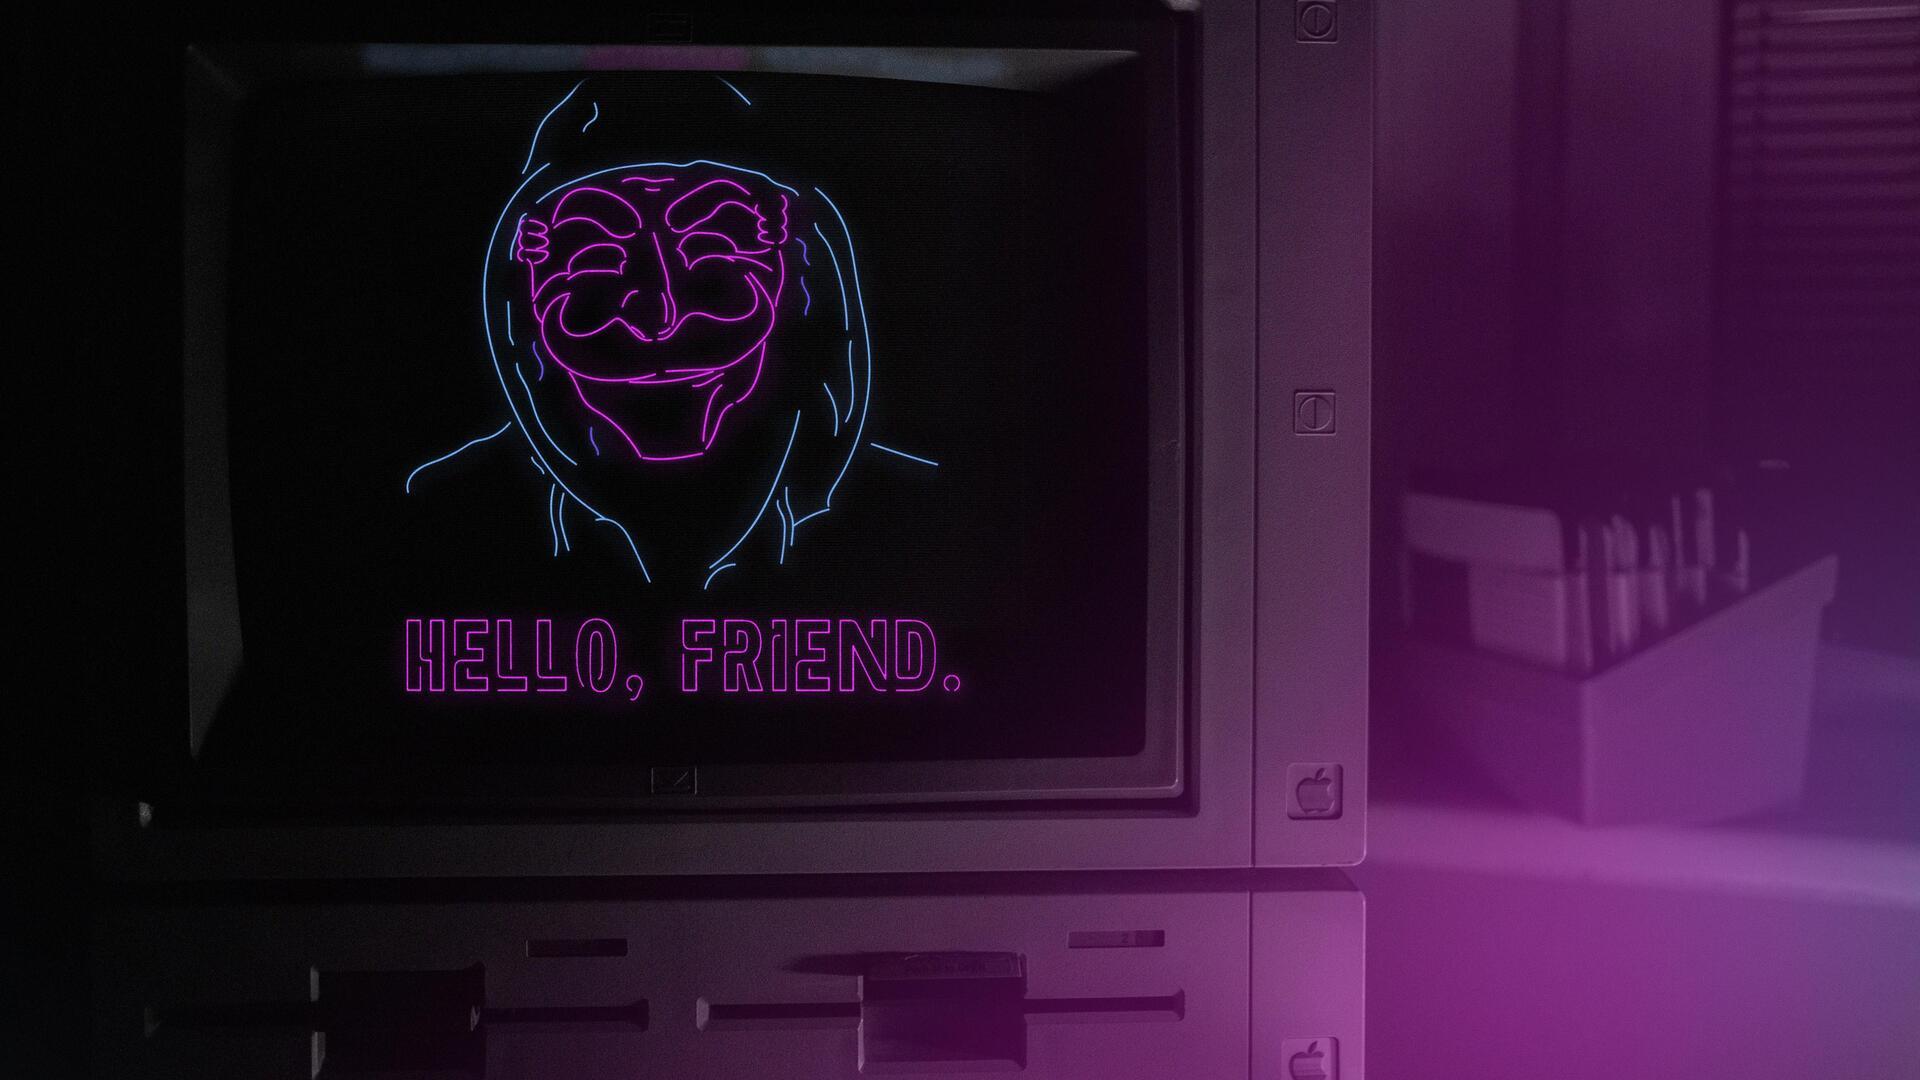 1920x1080 Hello Friend Mr Robot 4k Laptop Full Hd 1080p Hd